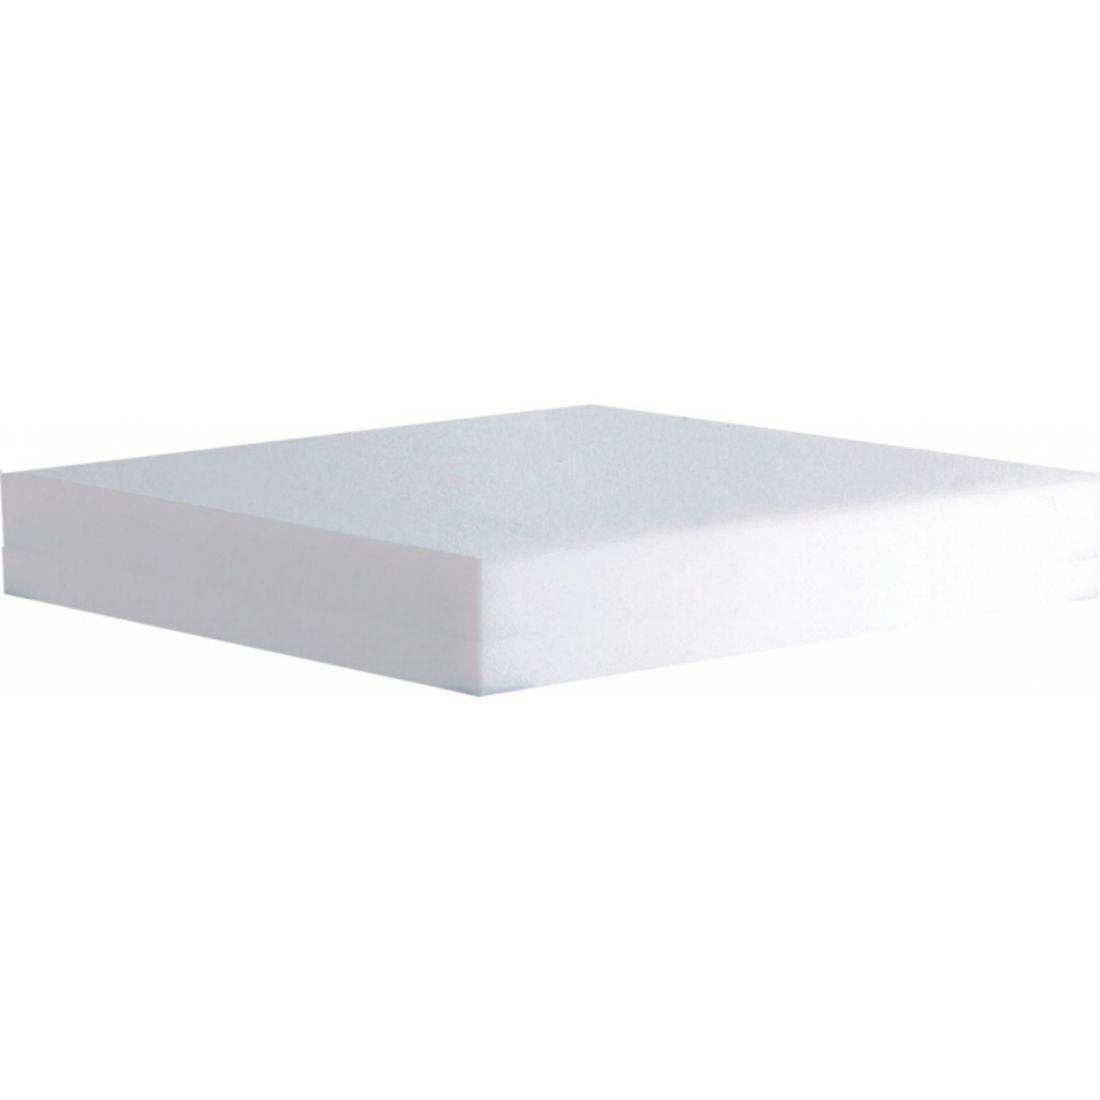 Blok porcovací polyetylen 50x50 cm, výška 8 cm